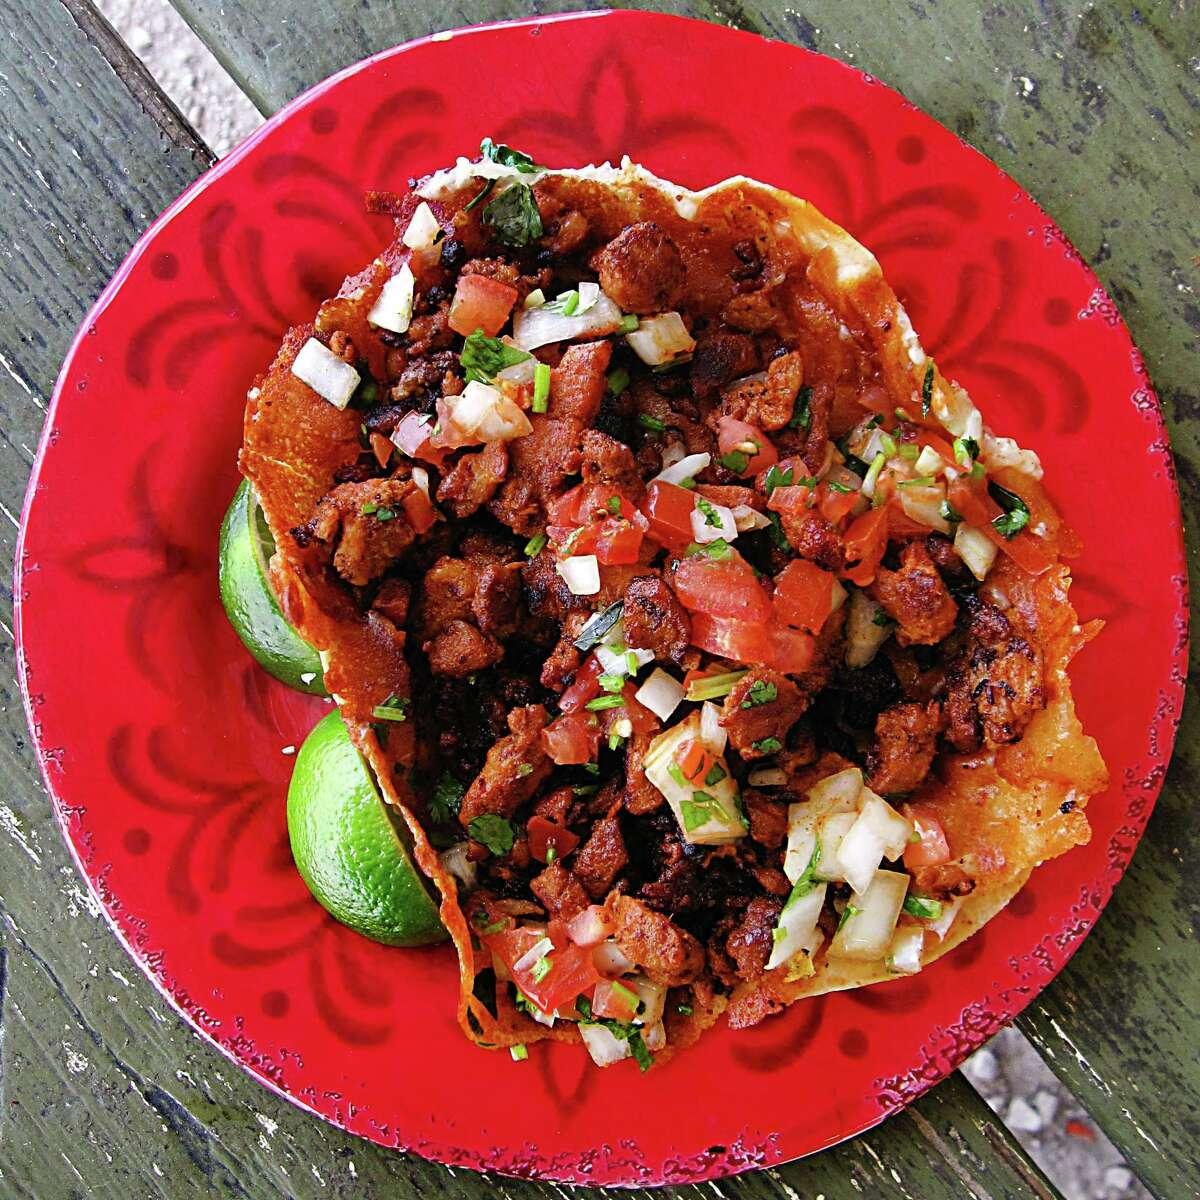 A gringa taco with al pastor, pico de gallo and cheese on a flour tortilla from Frank's Tacos.